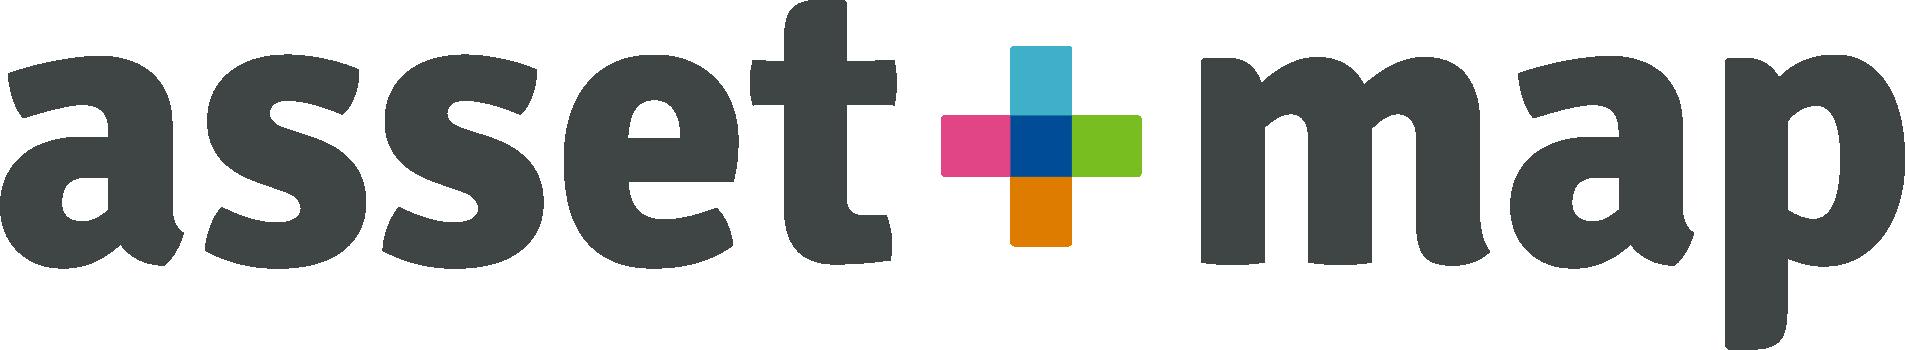 Asset-Map™ company logo